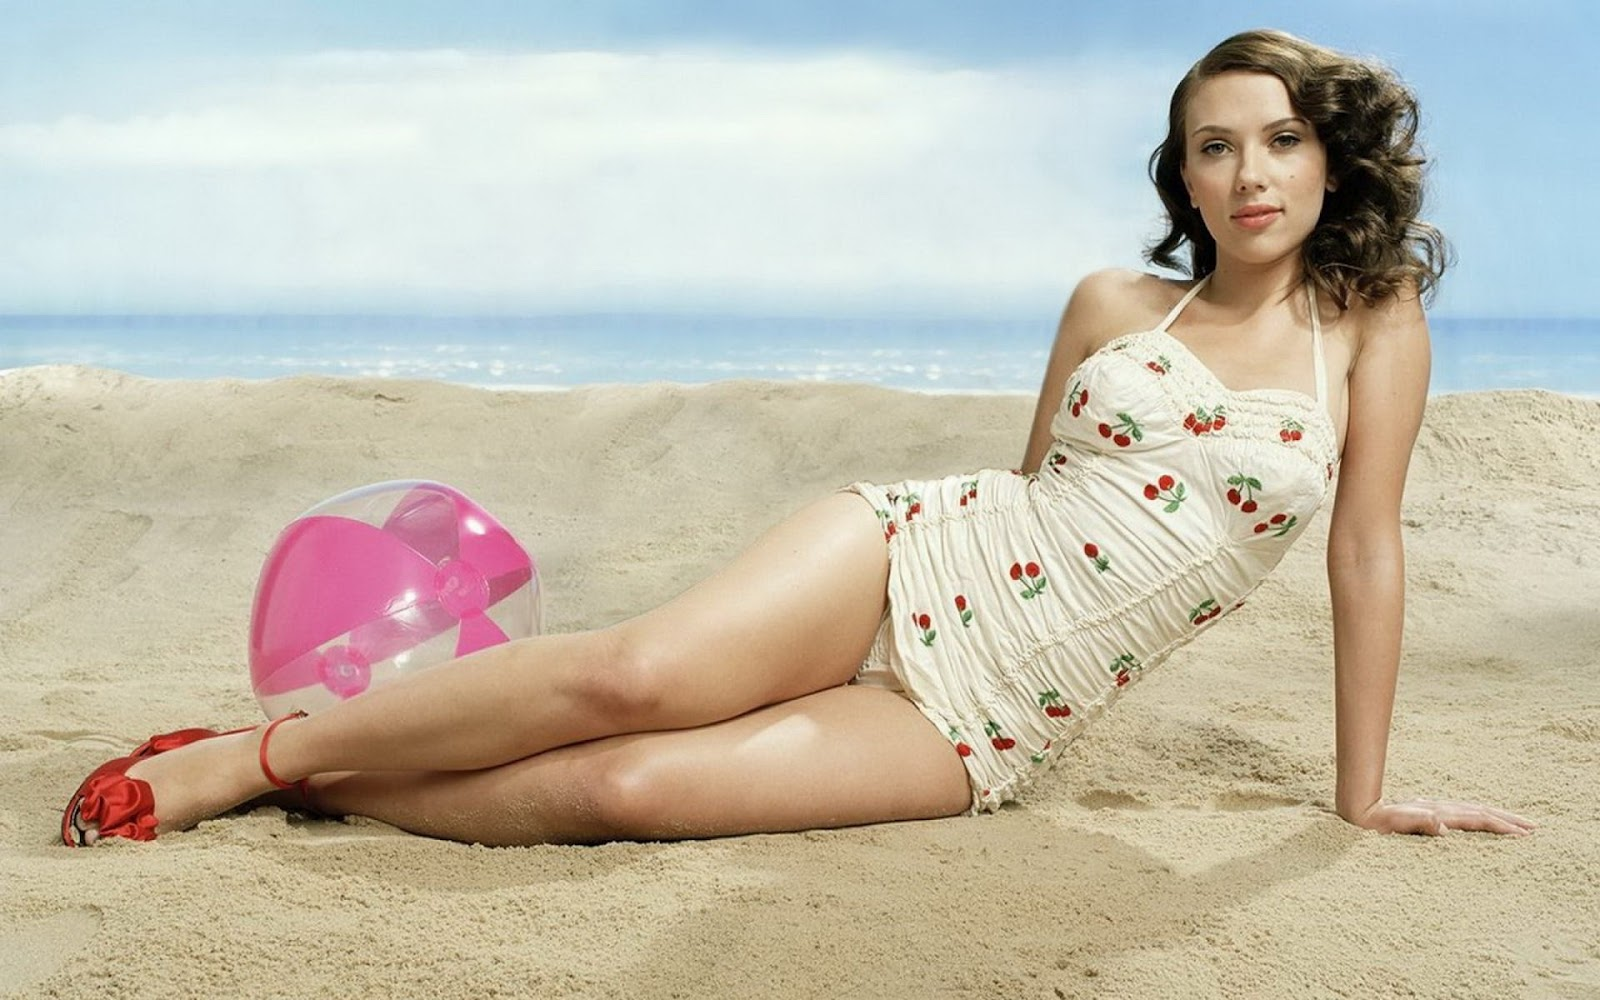 Widescreen bikini wallpaper